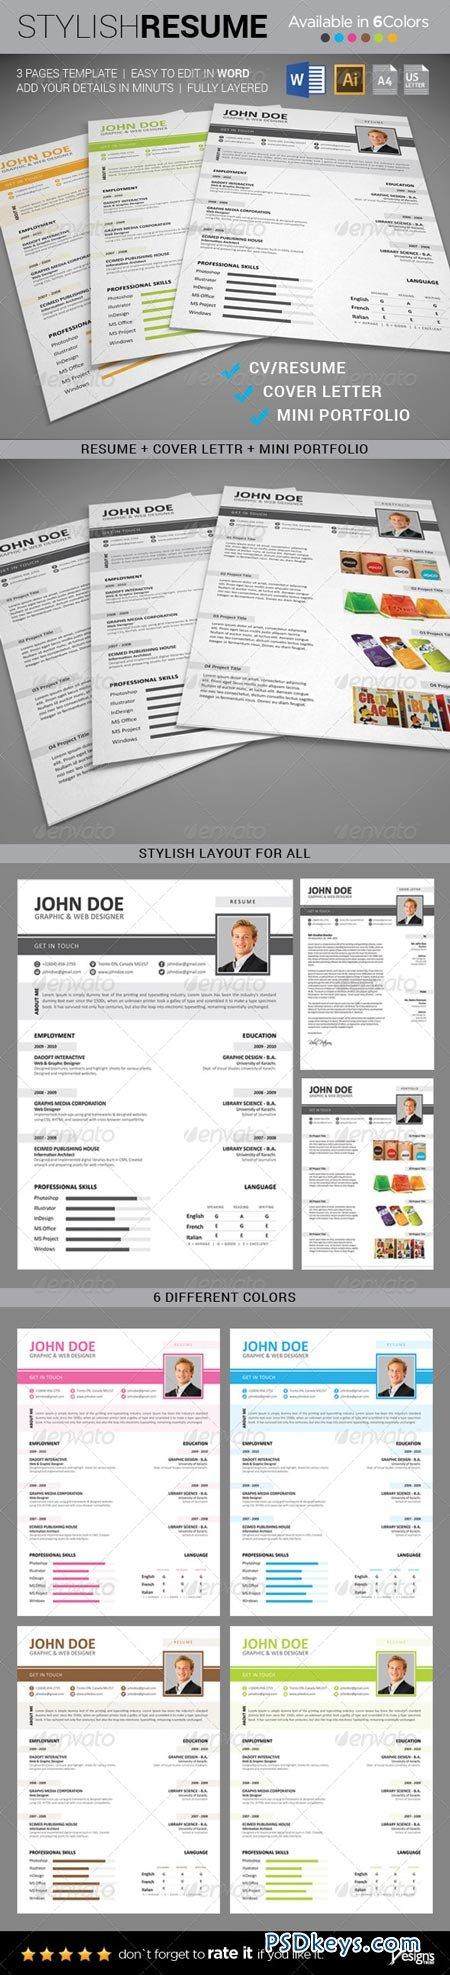 Resume - CV Template 8642647